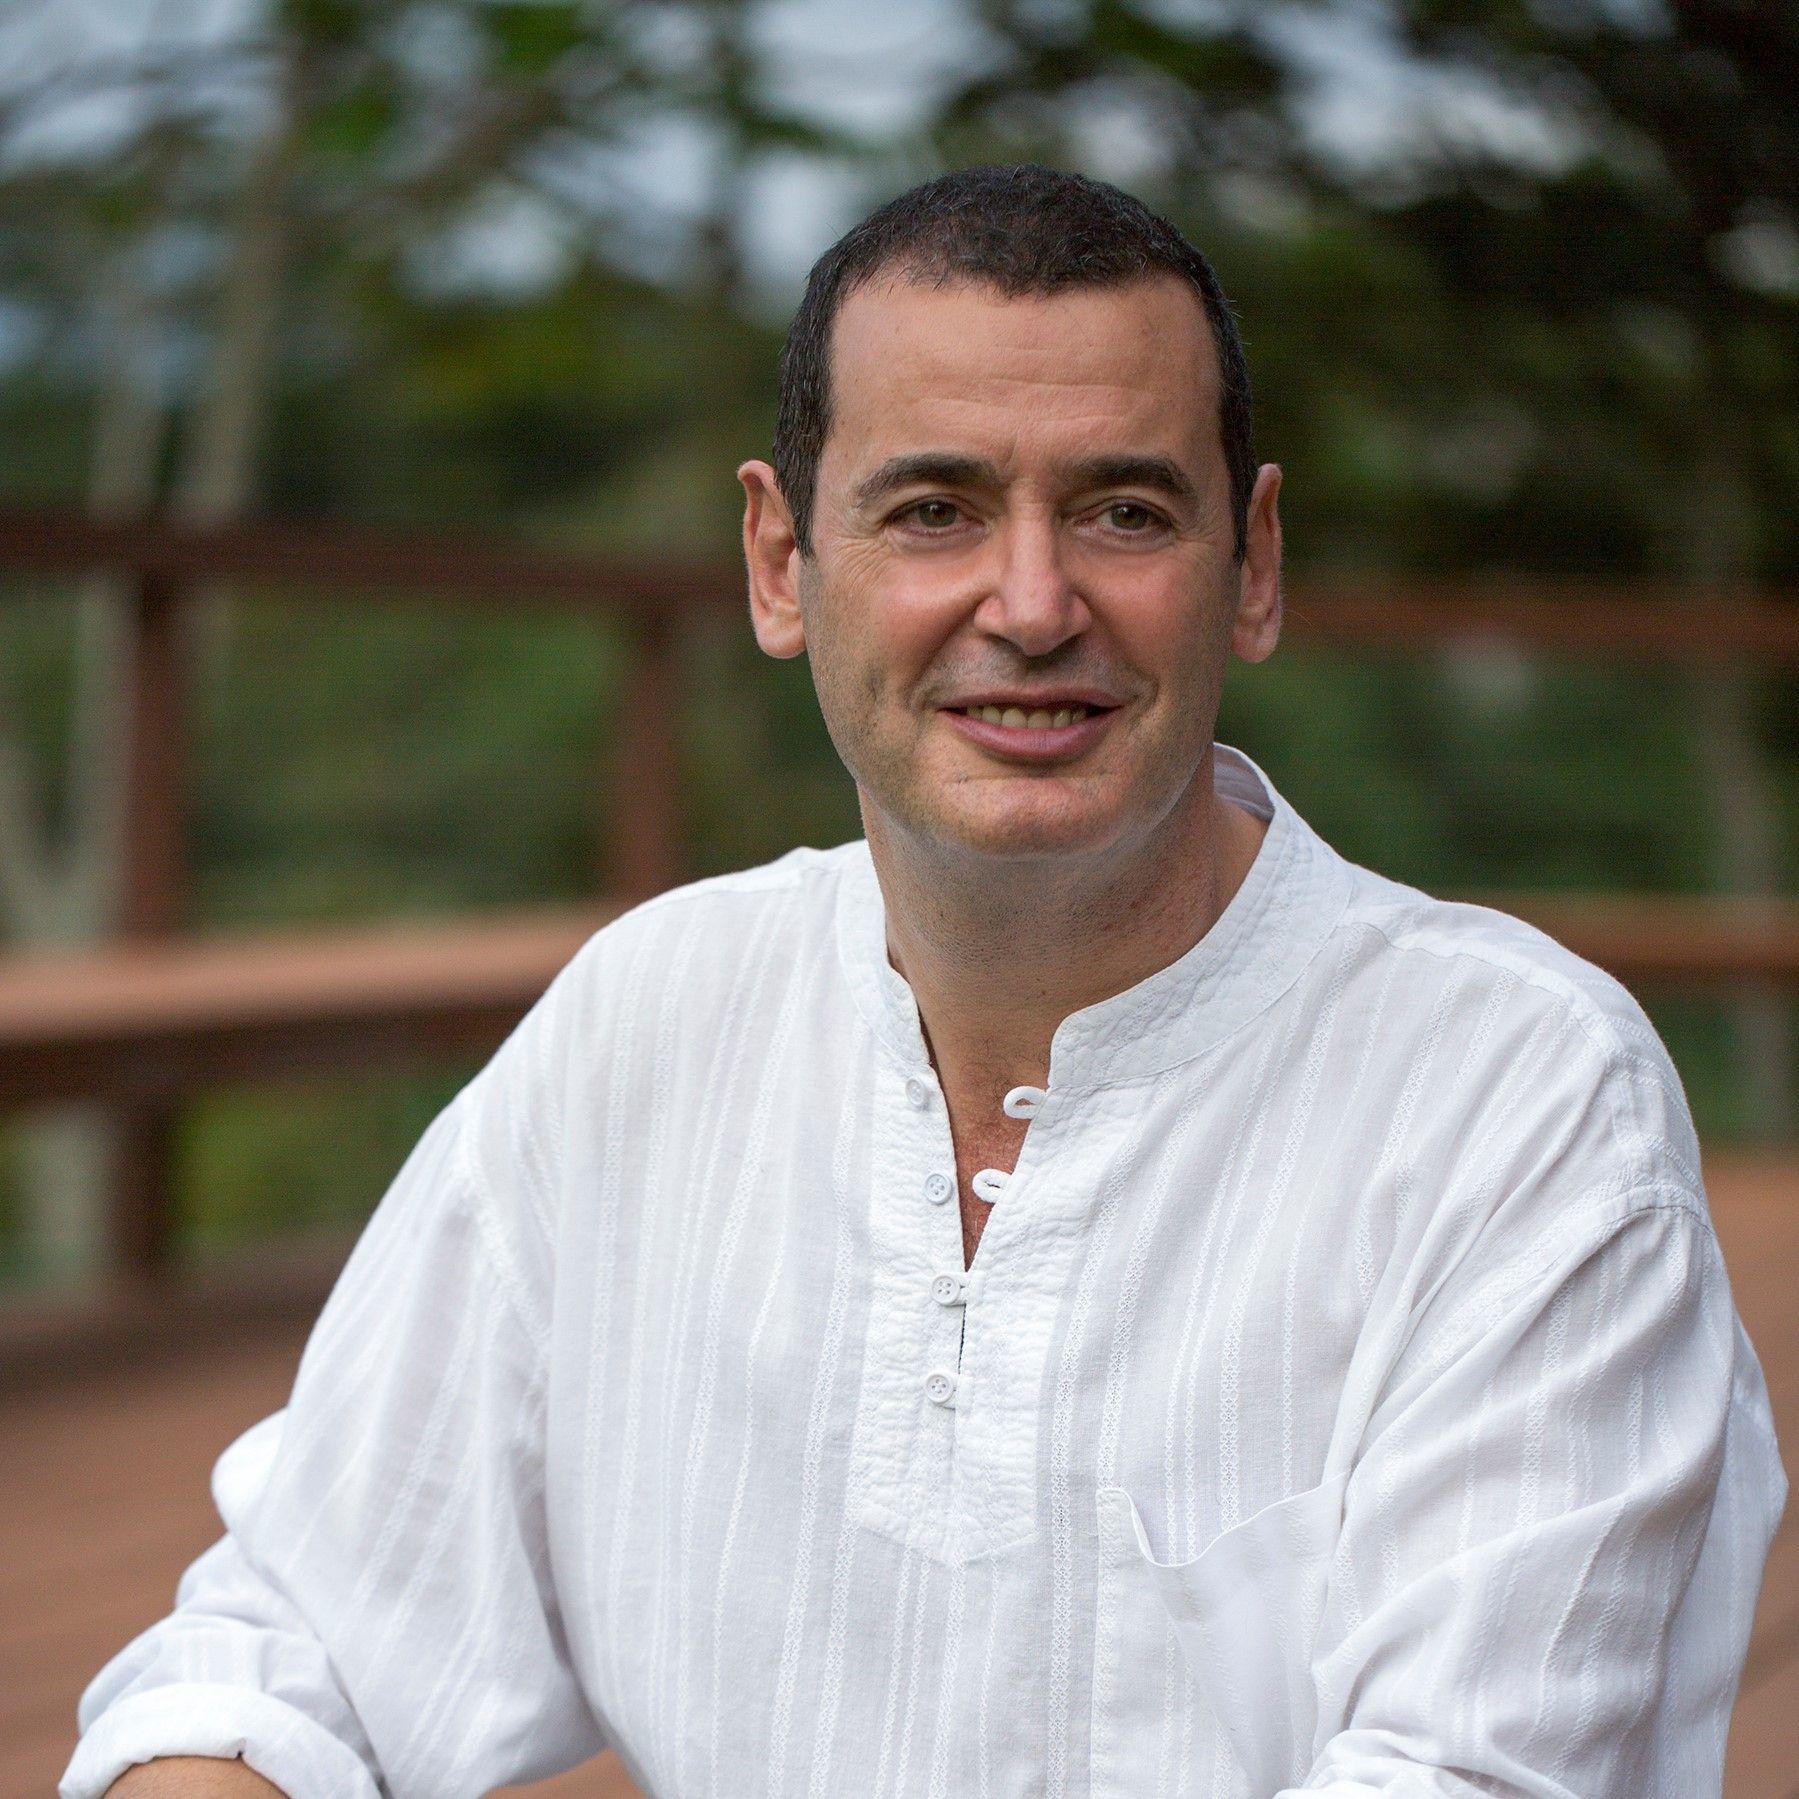 josep Soler